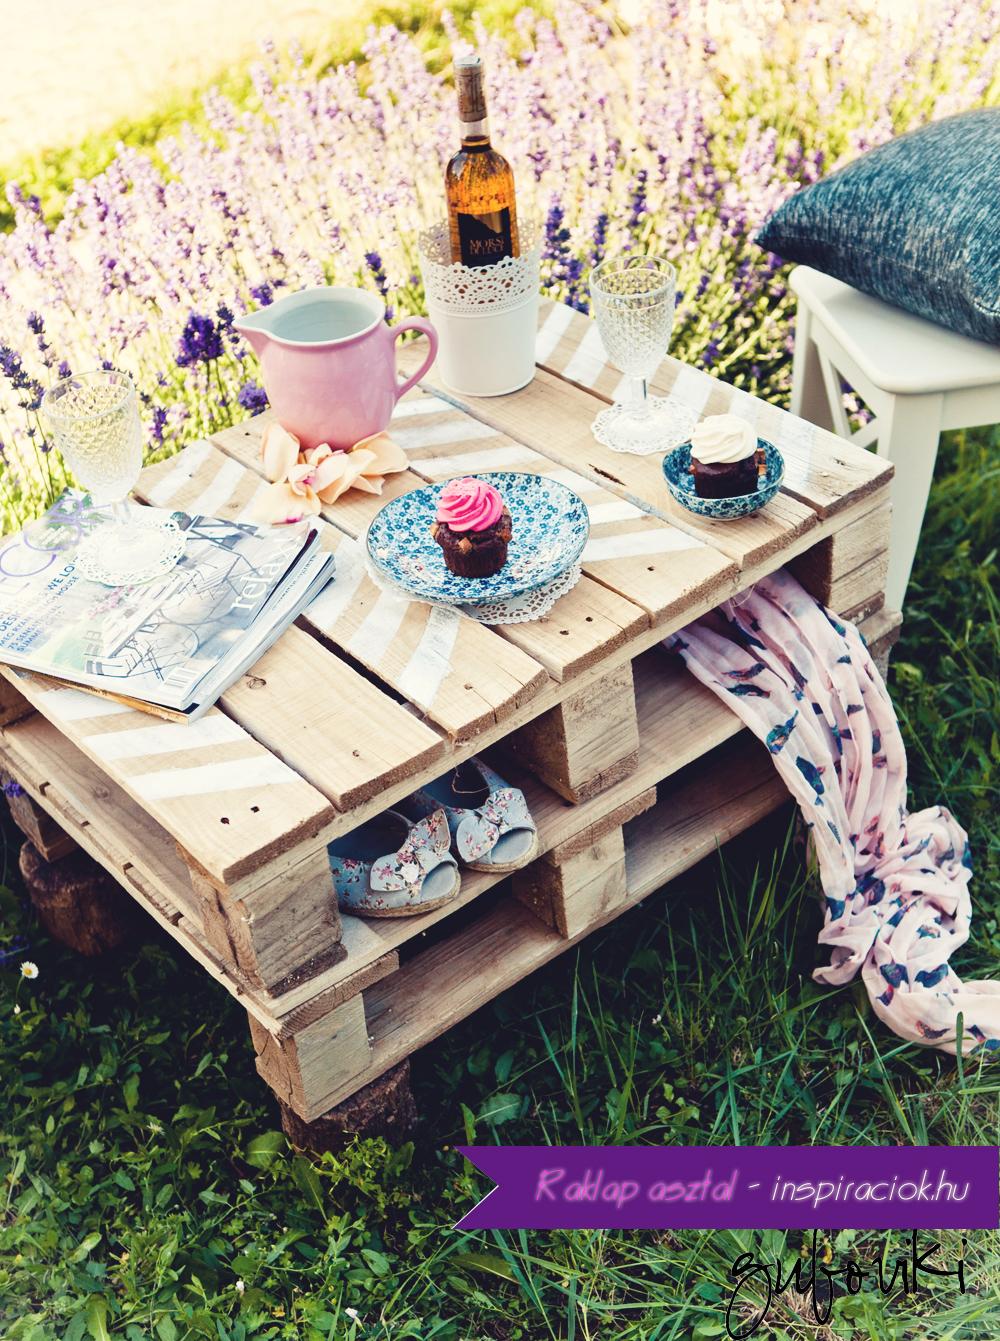 DIY pallet pinic table